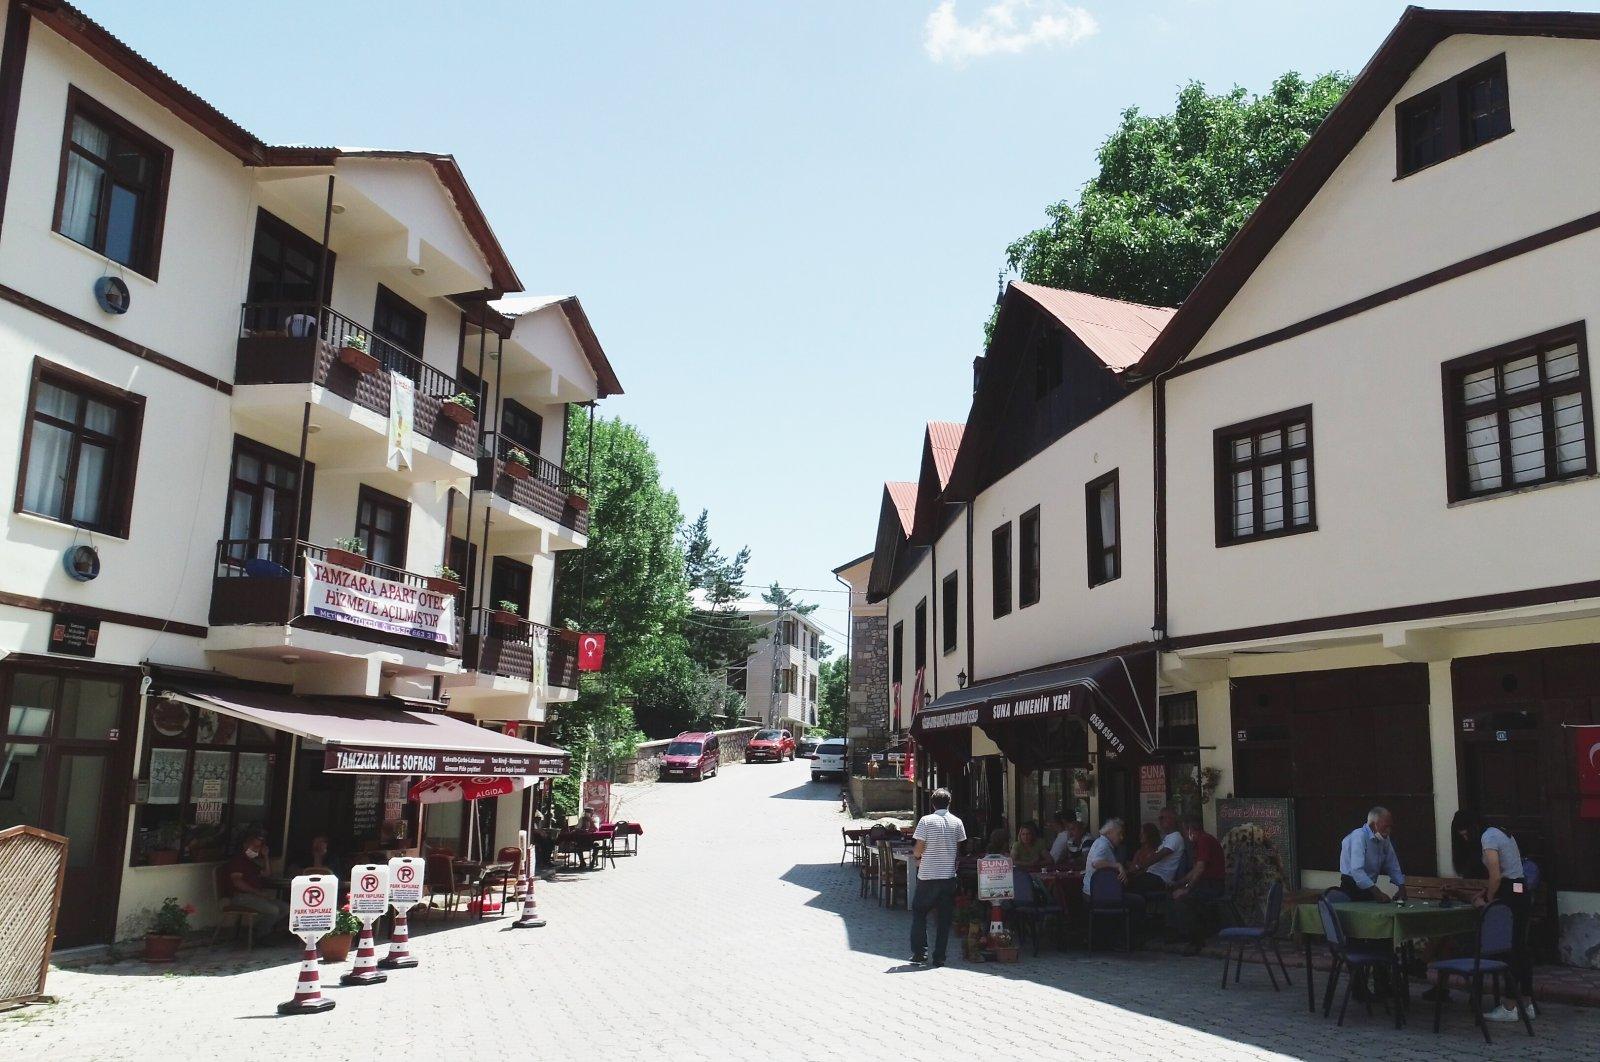 A view of the Tamzara neighborhood in Giresun, northern Turkey, July 18, 2020. (AA Photo)